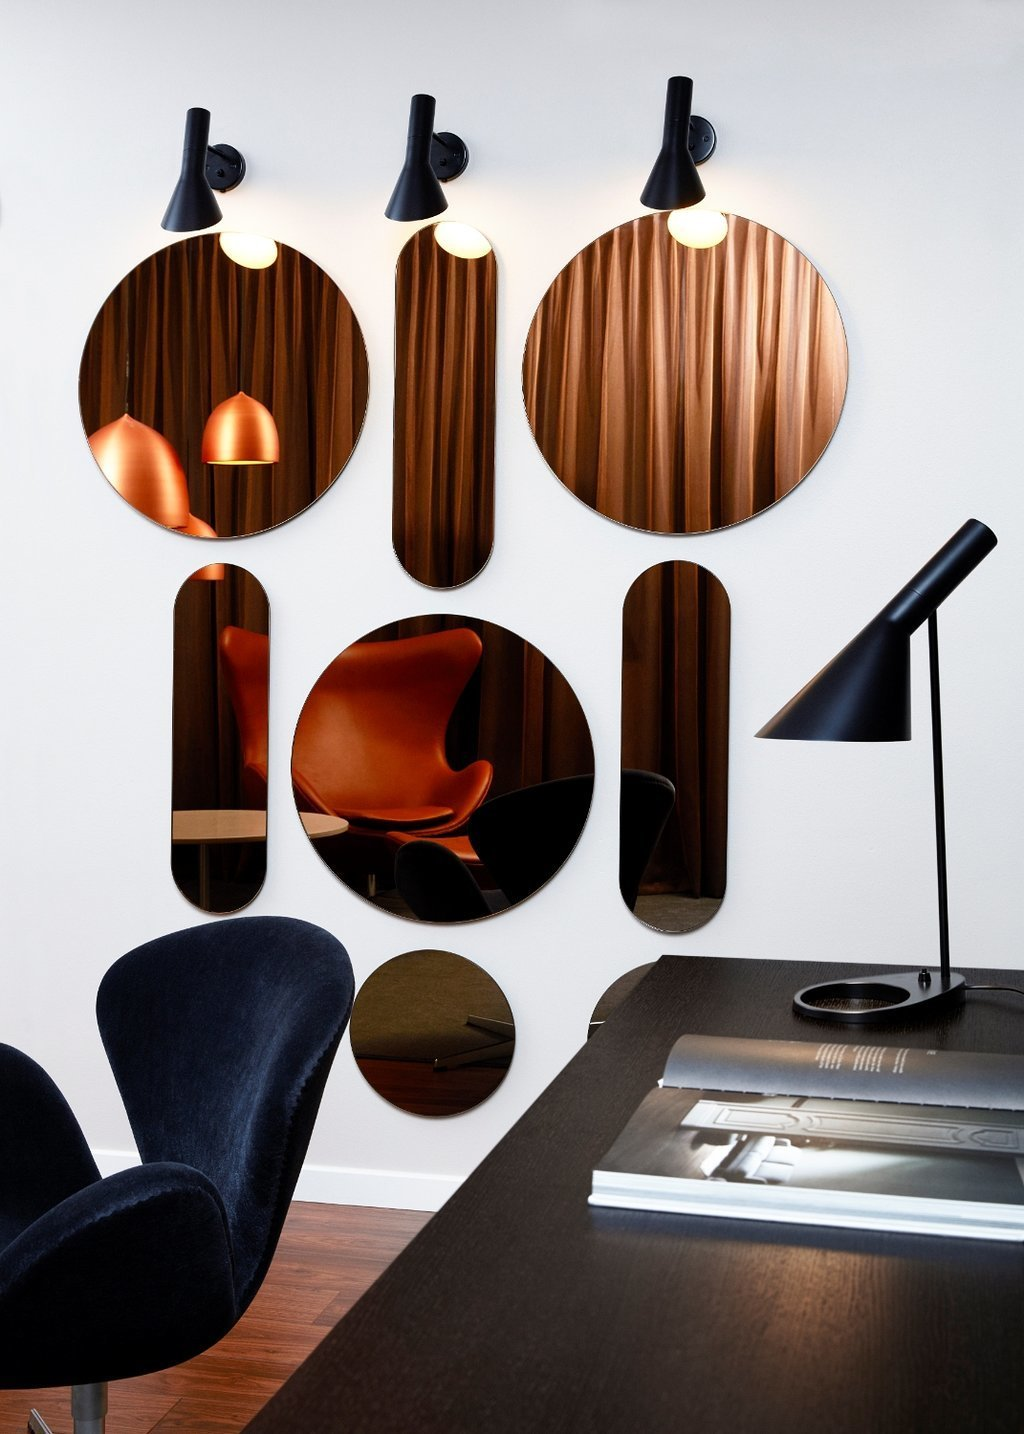 Living Room, Medium Hardwood Floor, Desk, Chair, Wall Lighting, and Table Lighting  Photos from Radisson Collection Royal Hotel, Copenhagen